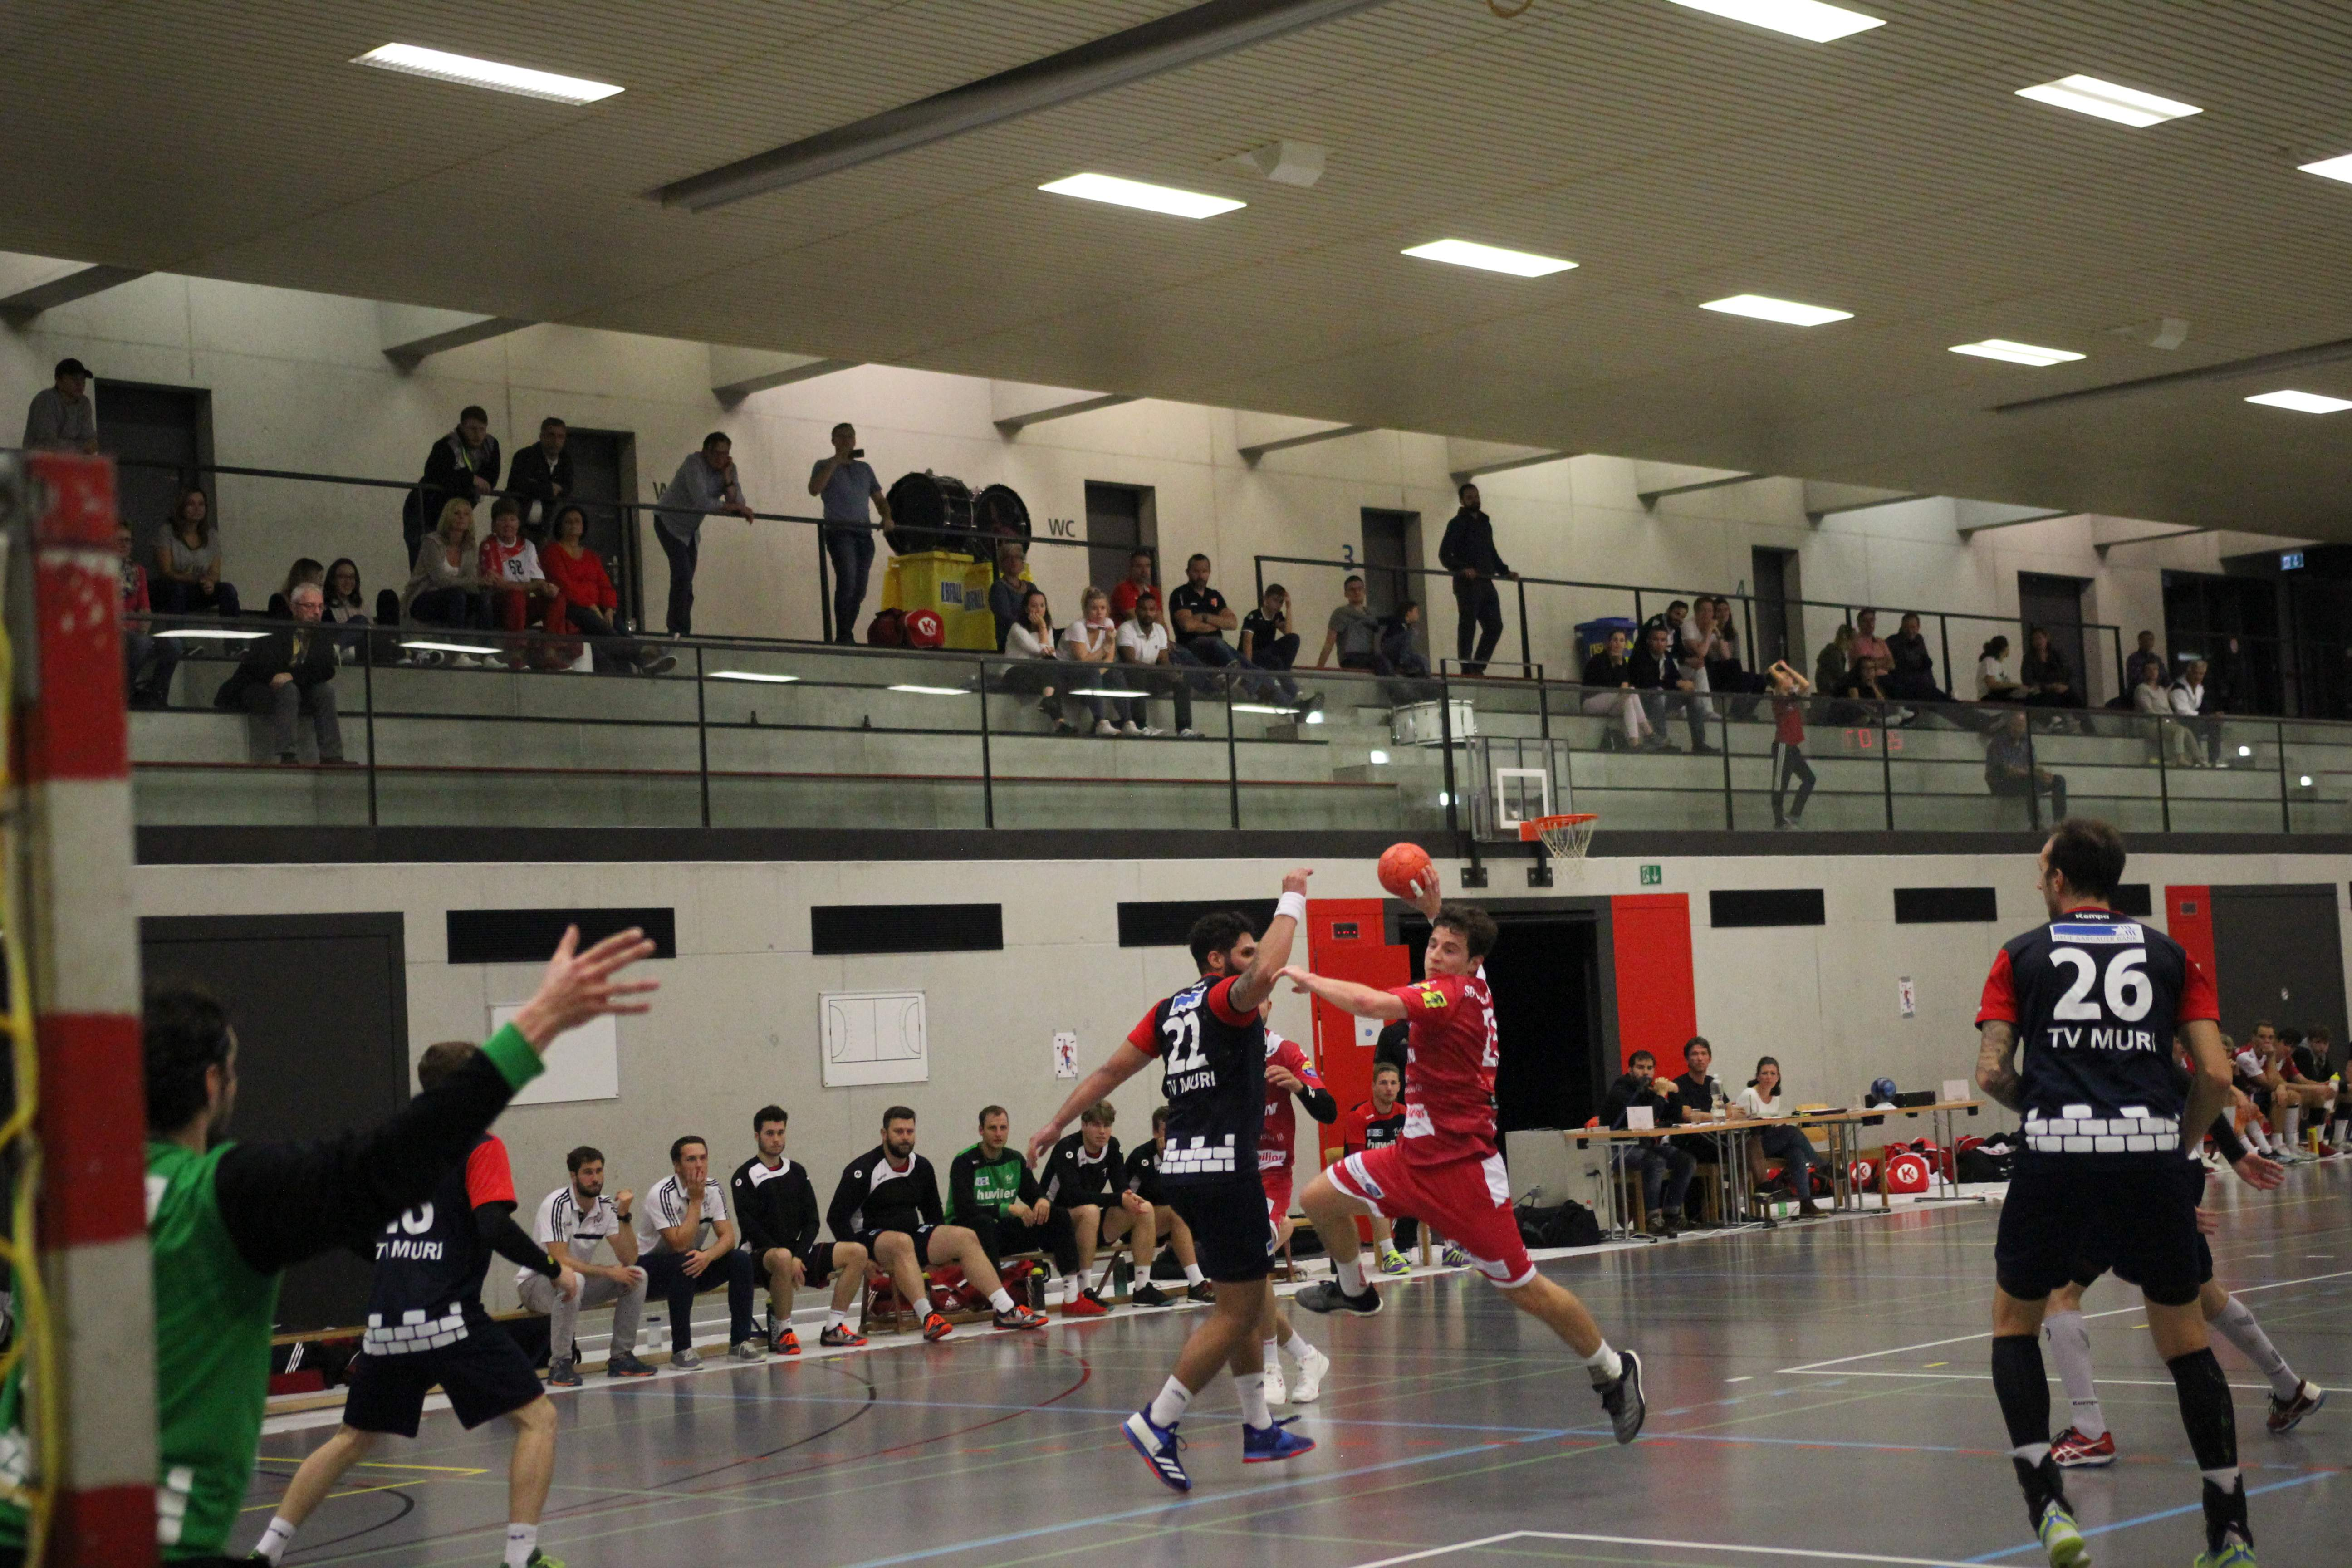 06.10.2018 - 1.Liga Gr.3 SG Horgen/Wädenswil - TV Muri 24:32 (10:19)